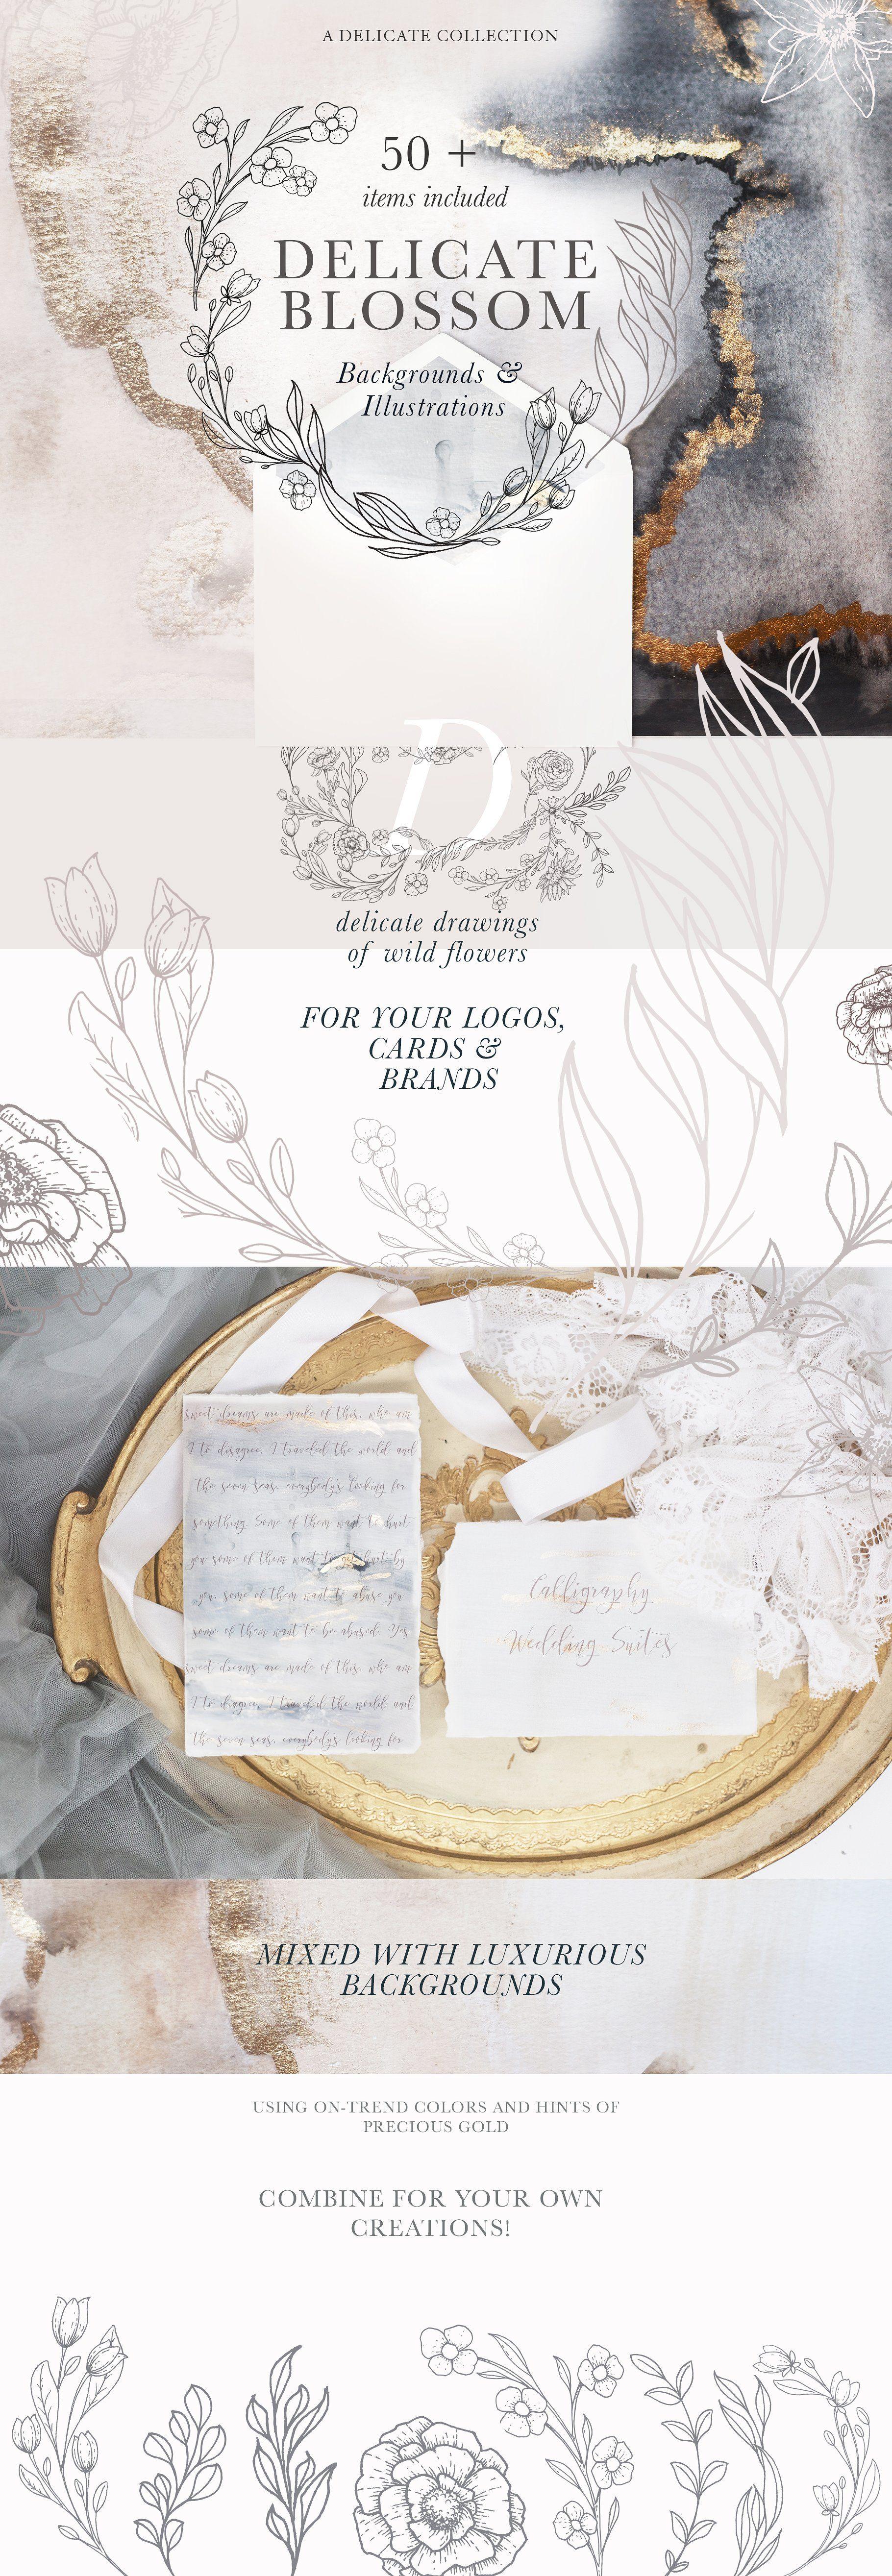 Modern Floral Illustrations Landing Page Templates Pinterest